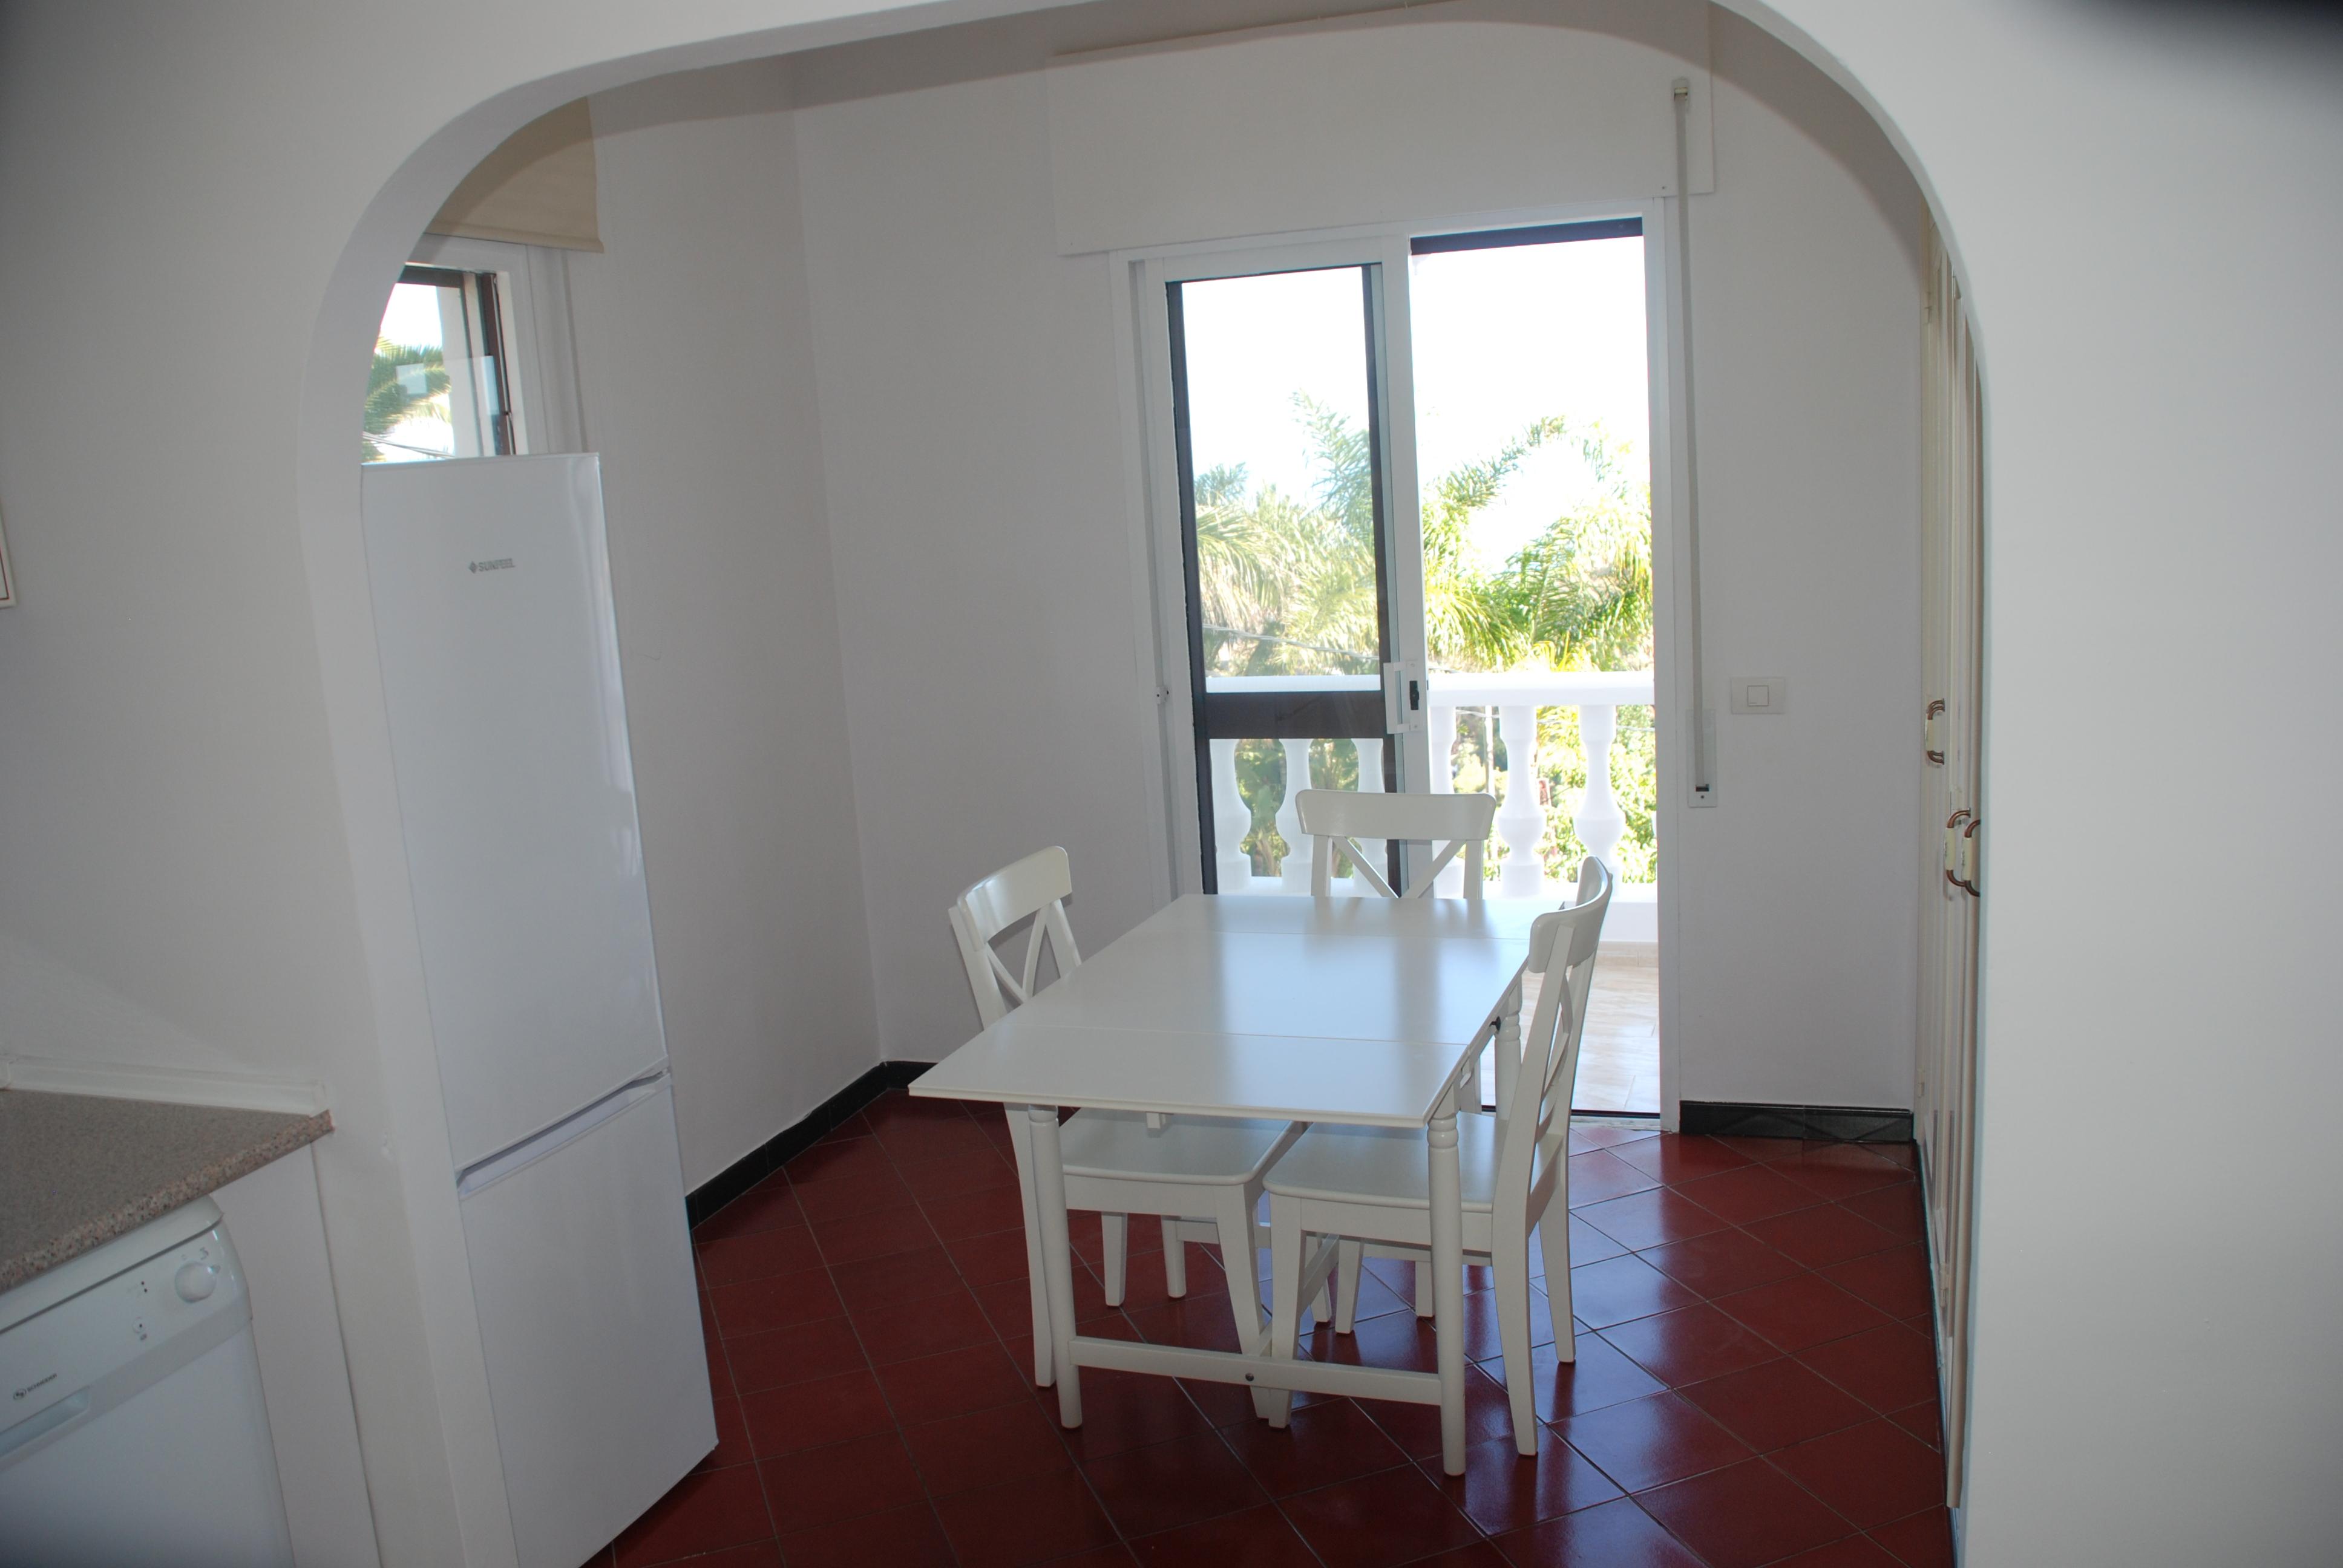 Maison de vacances Villa Vista La Quinta beheizbarer Pool kostenloses WLAN Grill (2124407), Santa Ursula, Ténérife, Iles Canaries, Espagne, image 59